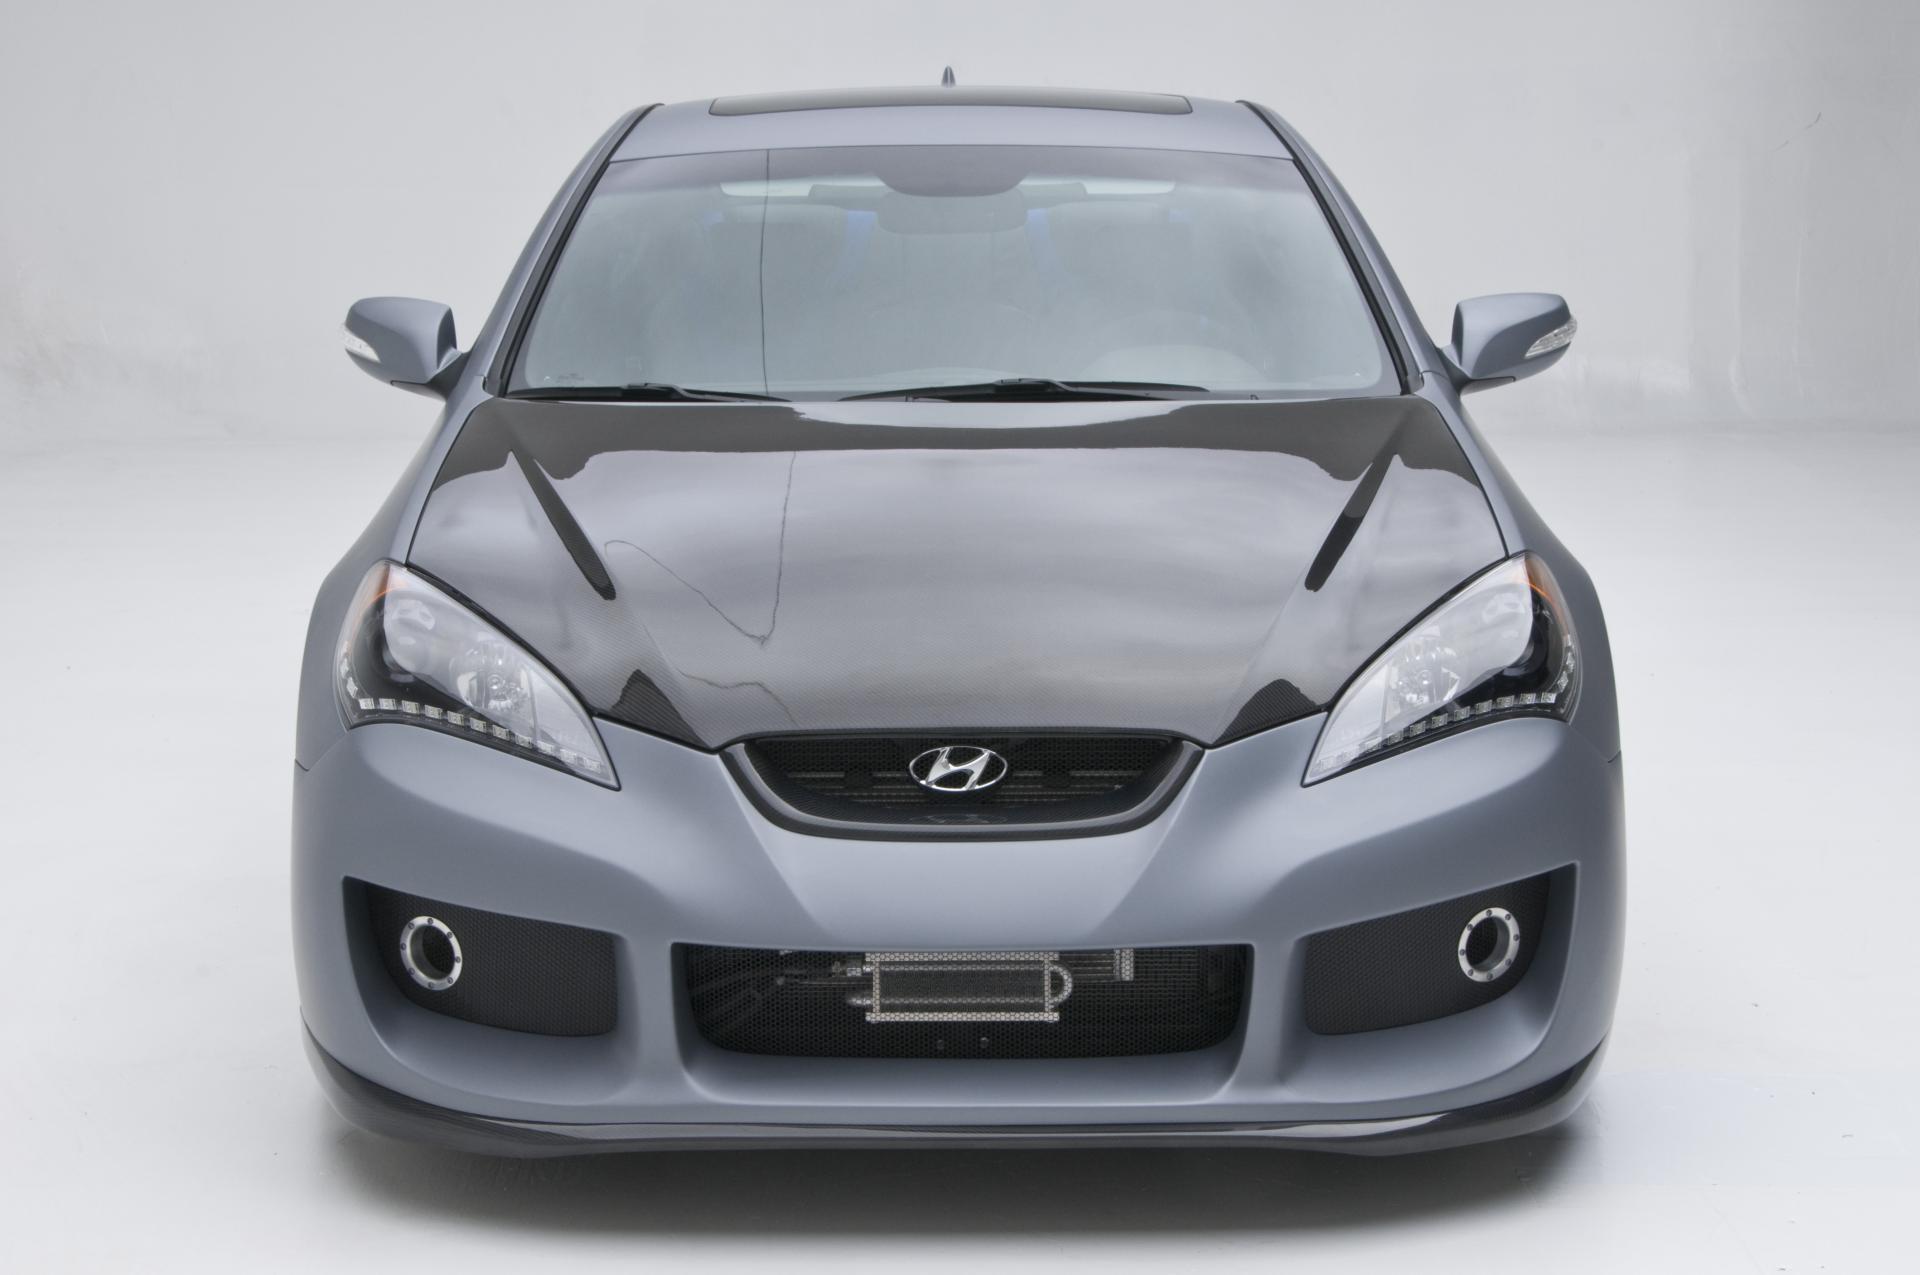 2011 Hyundai Genesis Hurricane SC